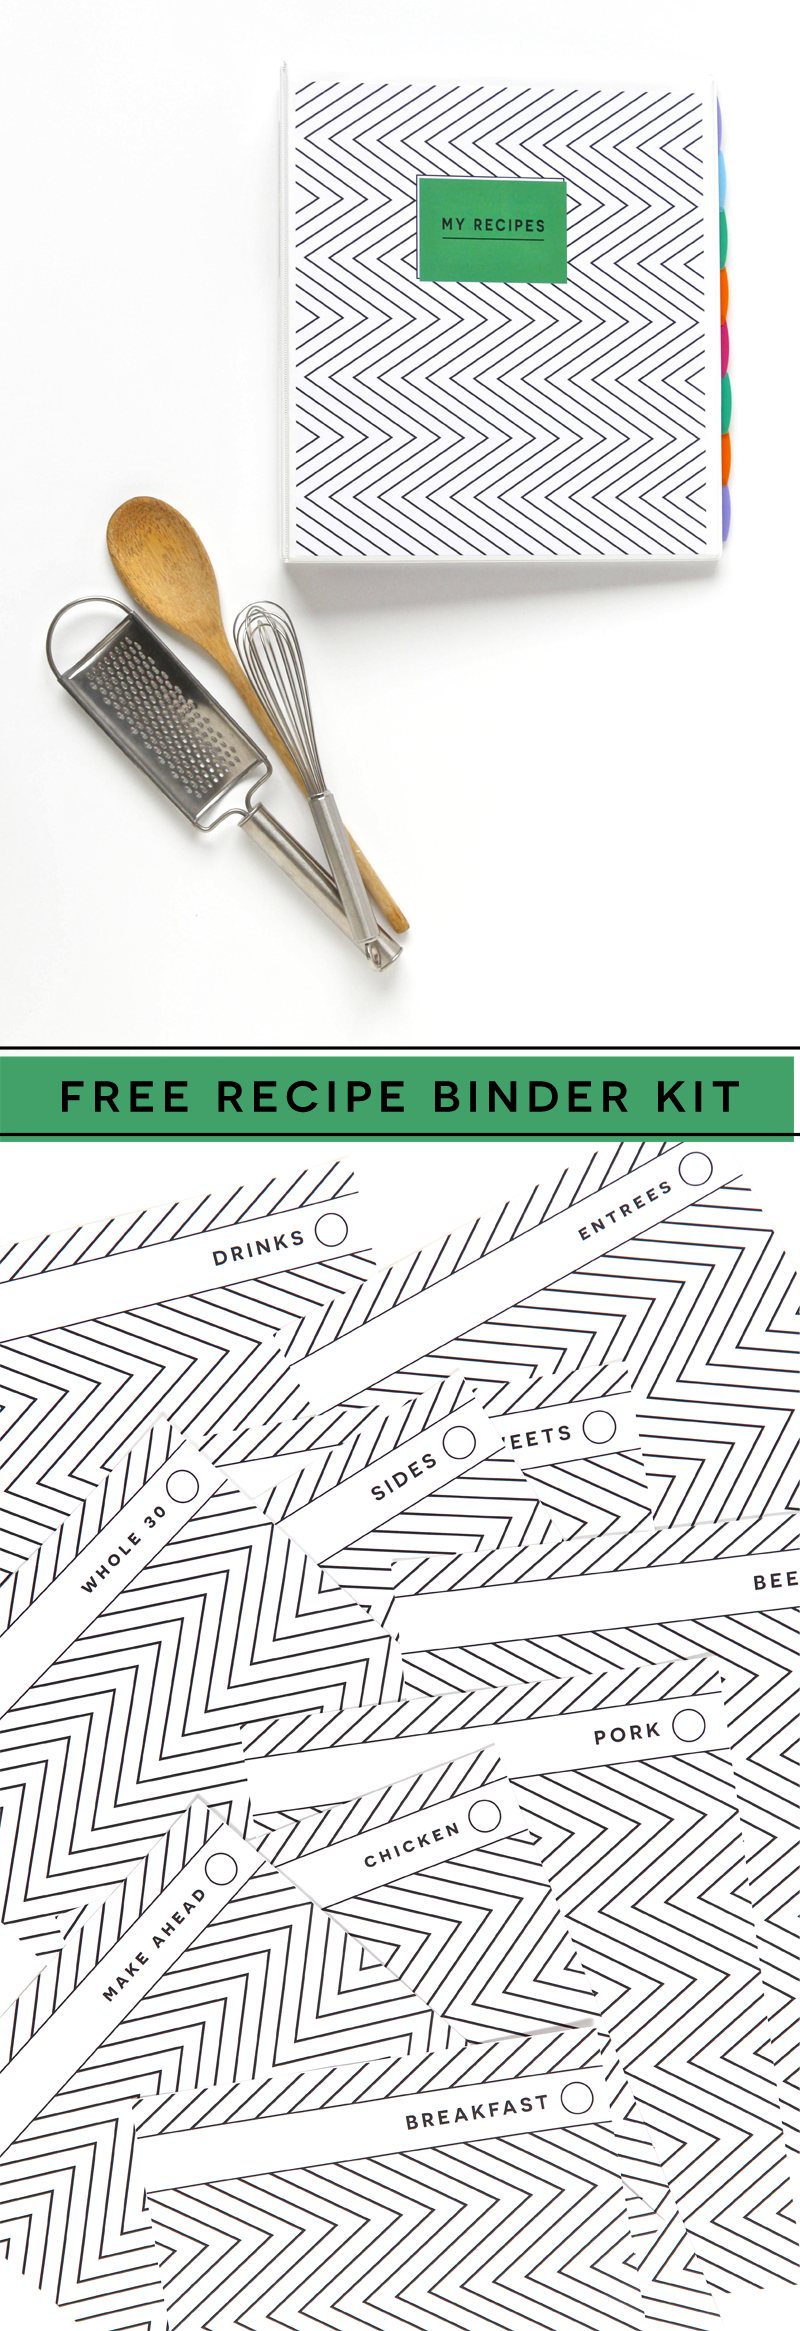 image relating to Free Printable Recipe Binder Kit referred to as Printable Recipe Binder Package - Absolutely free versus Paging Supermom